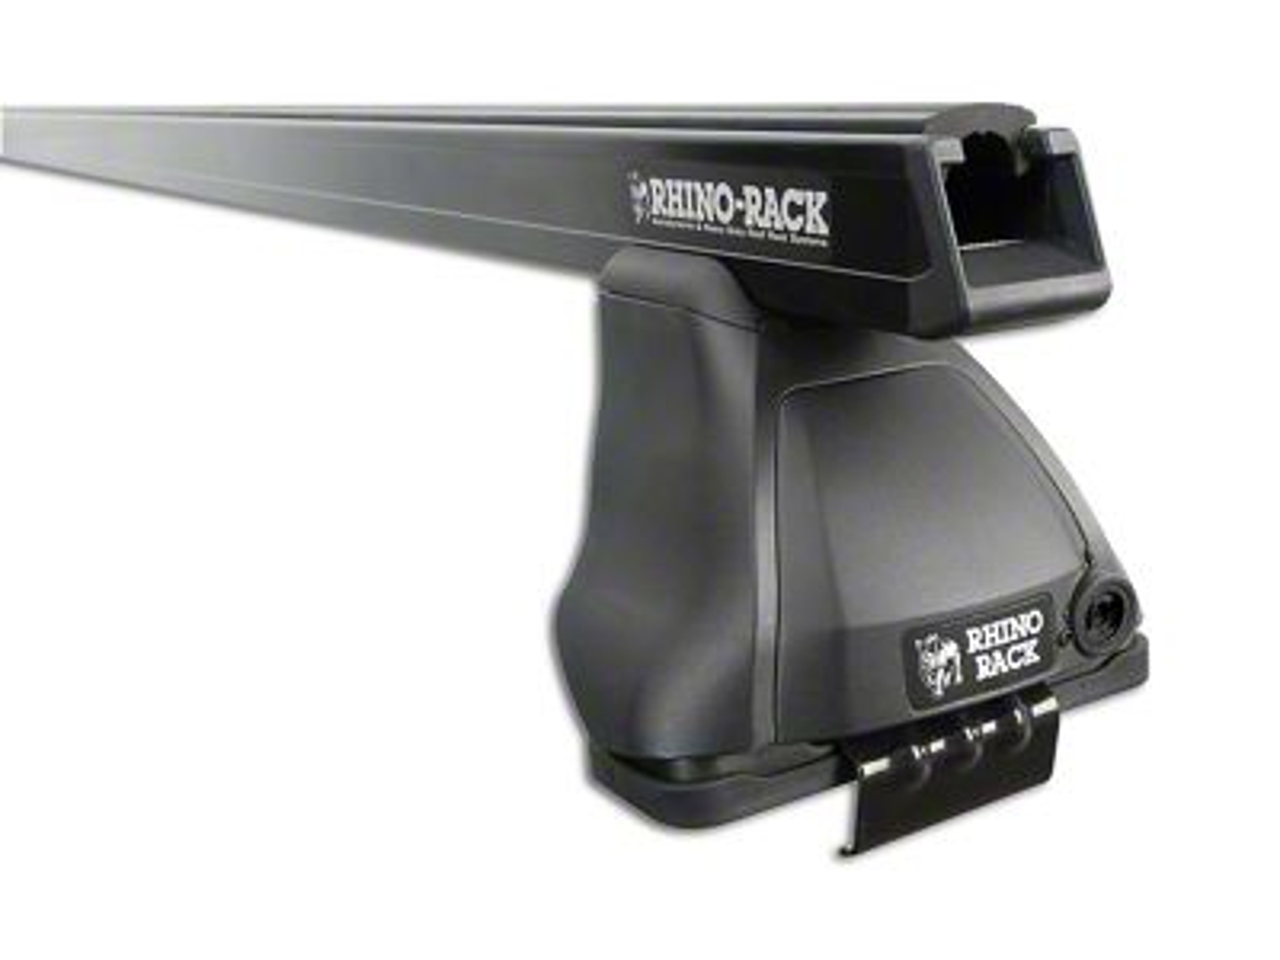 Rhino-Rack Heavy Duty 2500 2-Bar Roof Rack - Black (09-18 RAM 1500 Quad Cab, Crew Cab)